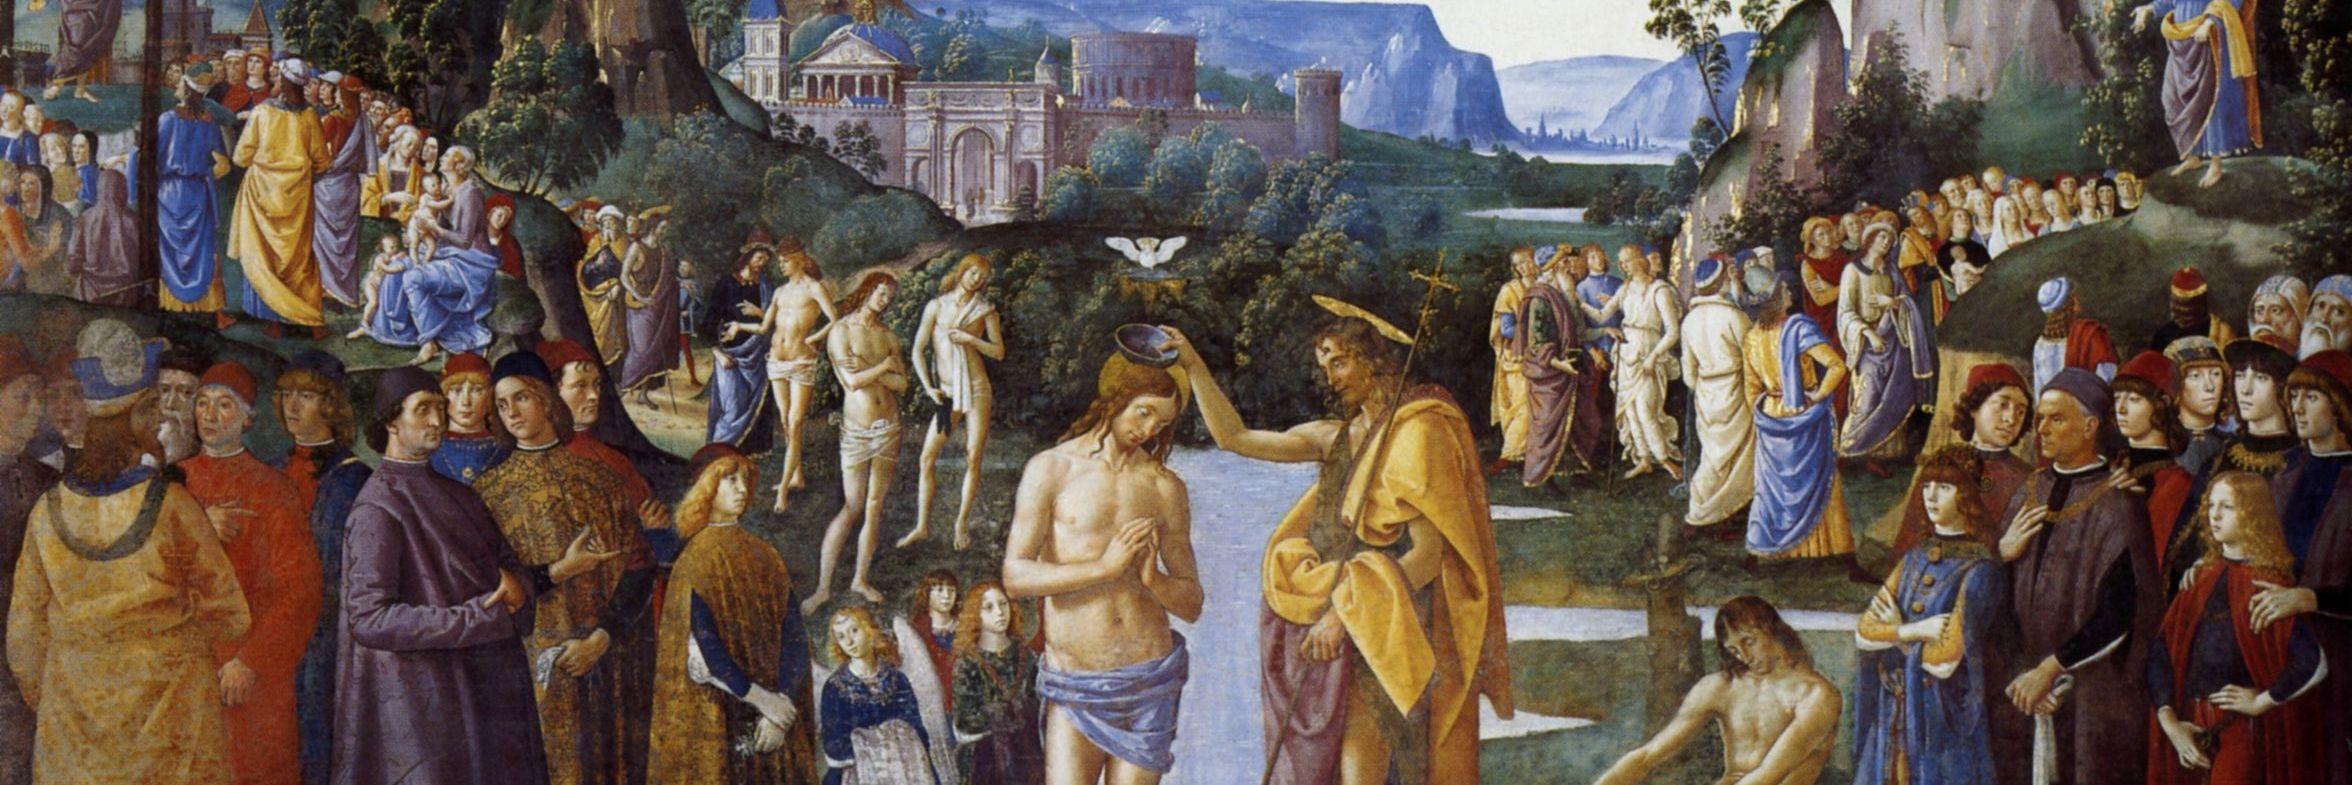 jesus of nazareth baptism to transfiguration book review